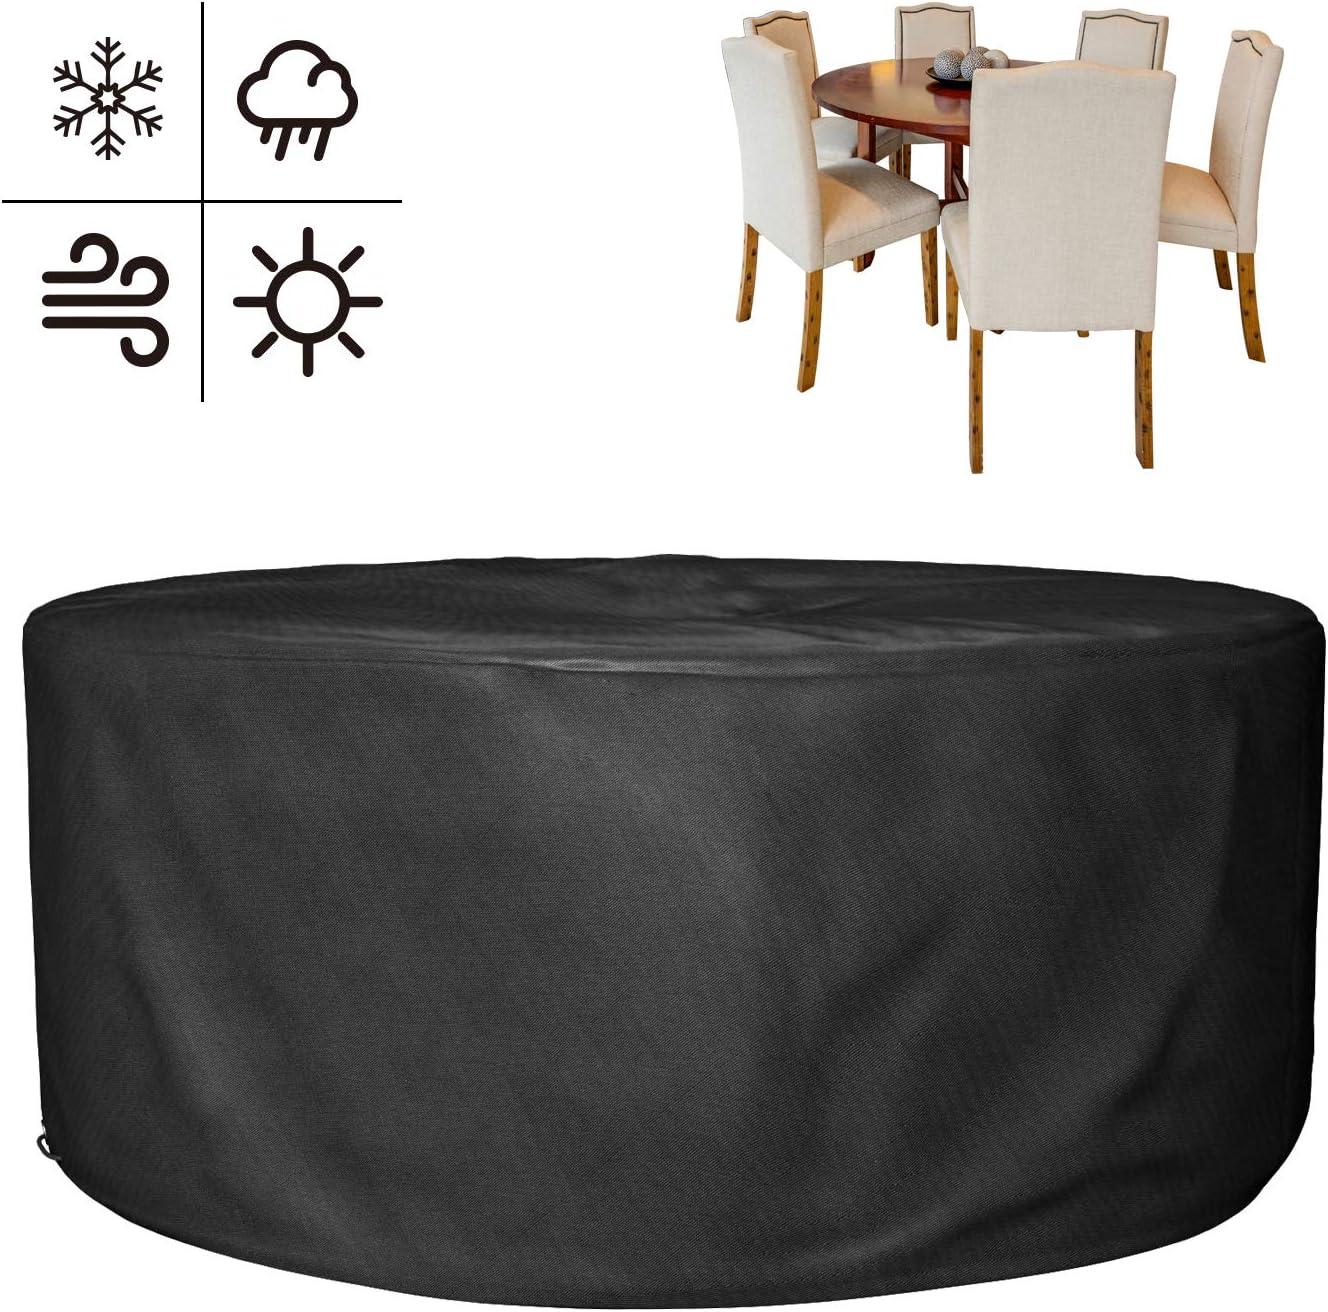 MVPOWER Cubierta Impermeable para Muebles de Jardín, Funda Protectora para Mesa Redonda, Cubierta Oxford de Exterior, Negro (130 * 71cm)